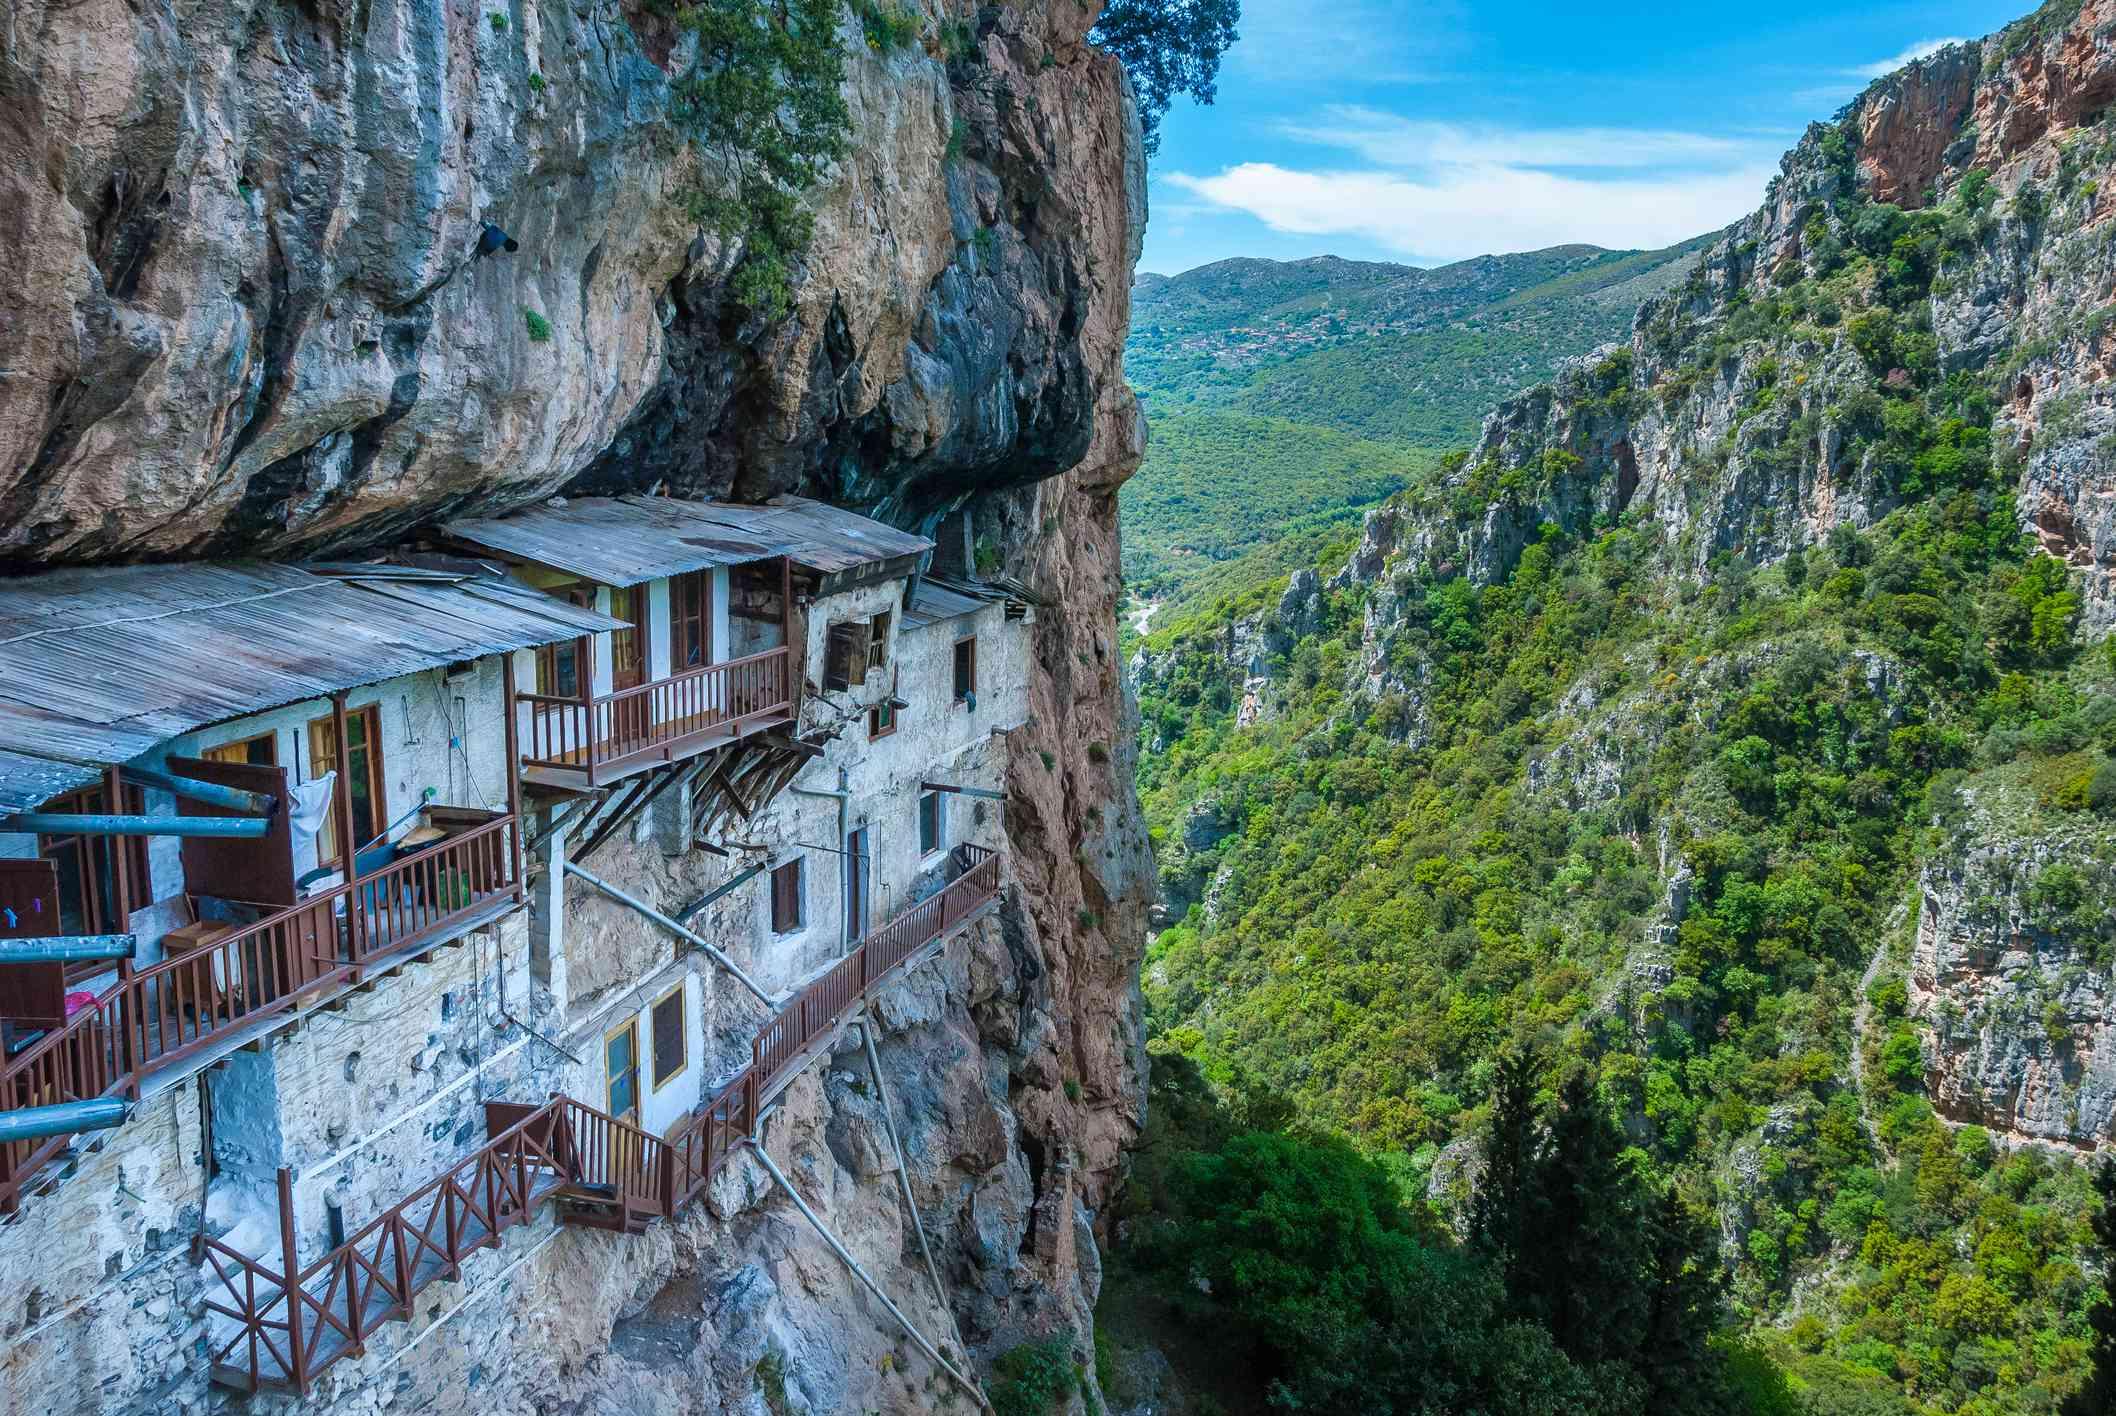 Prodromos monastery in Arcadia prefecture in Peloponnese, Greece